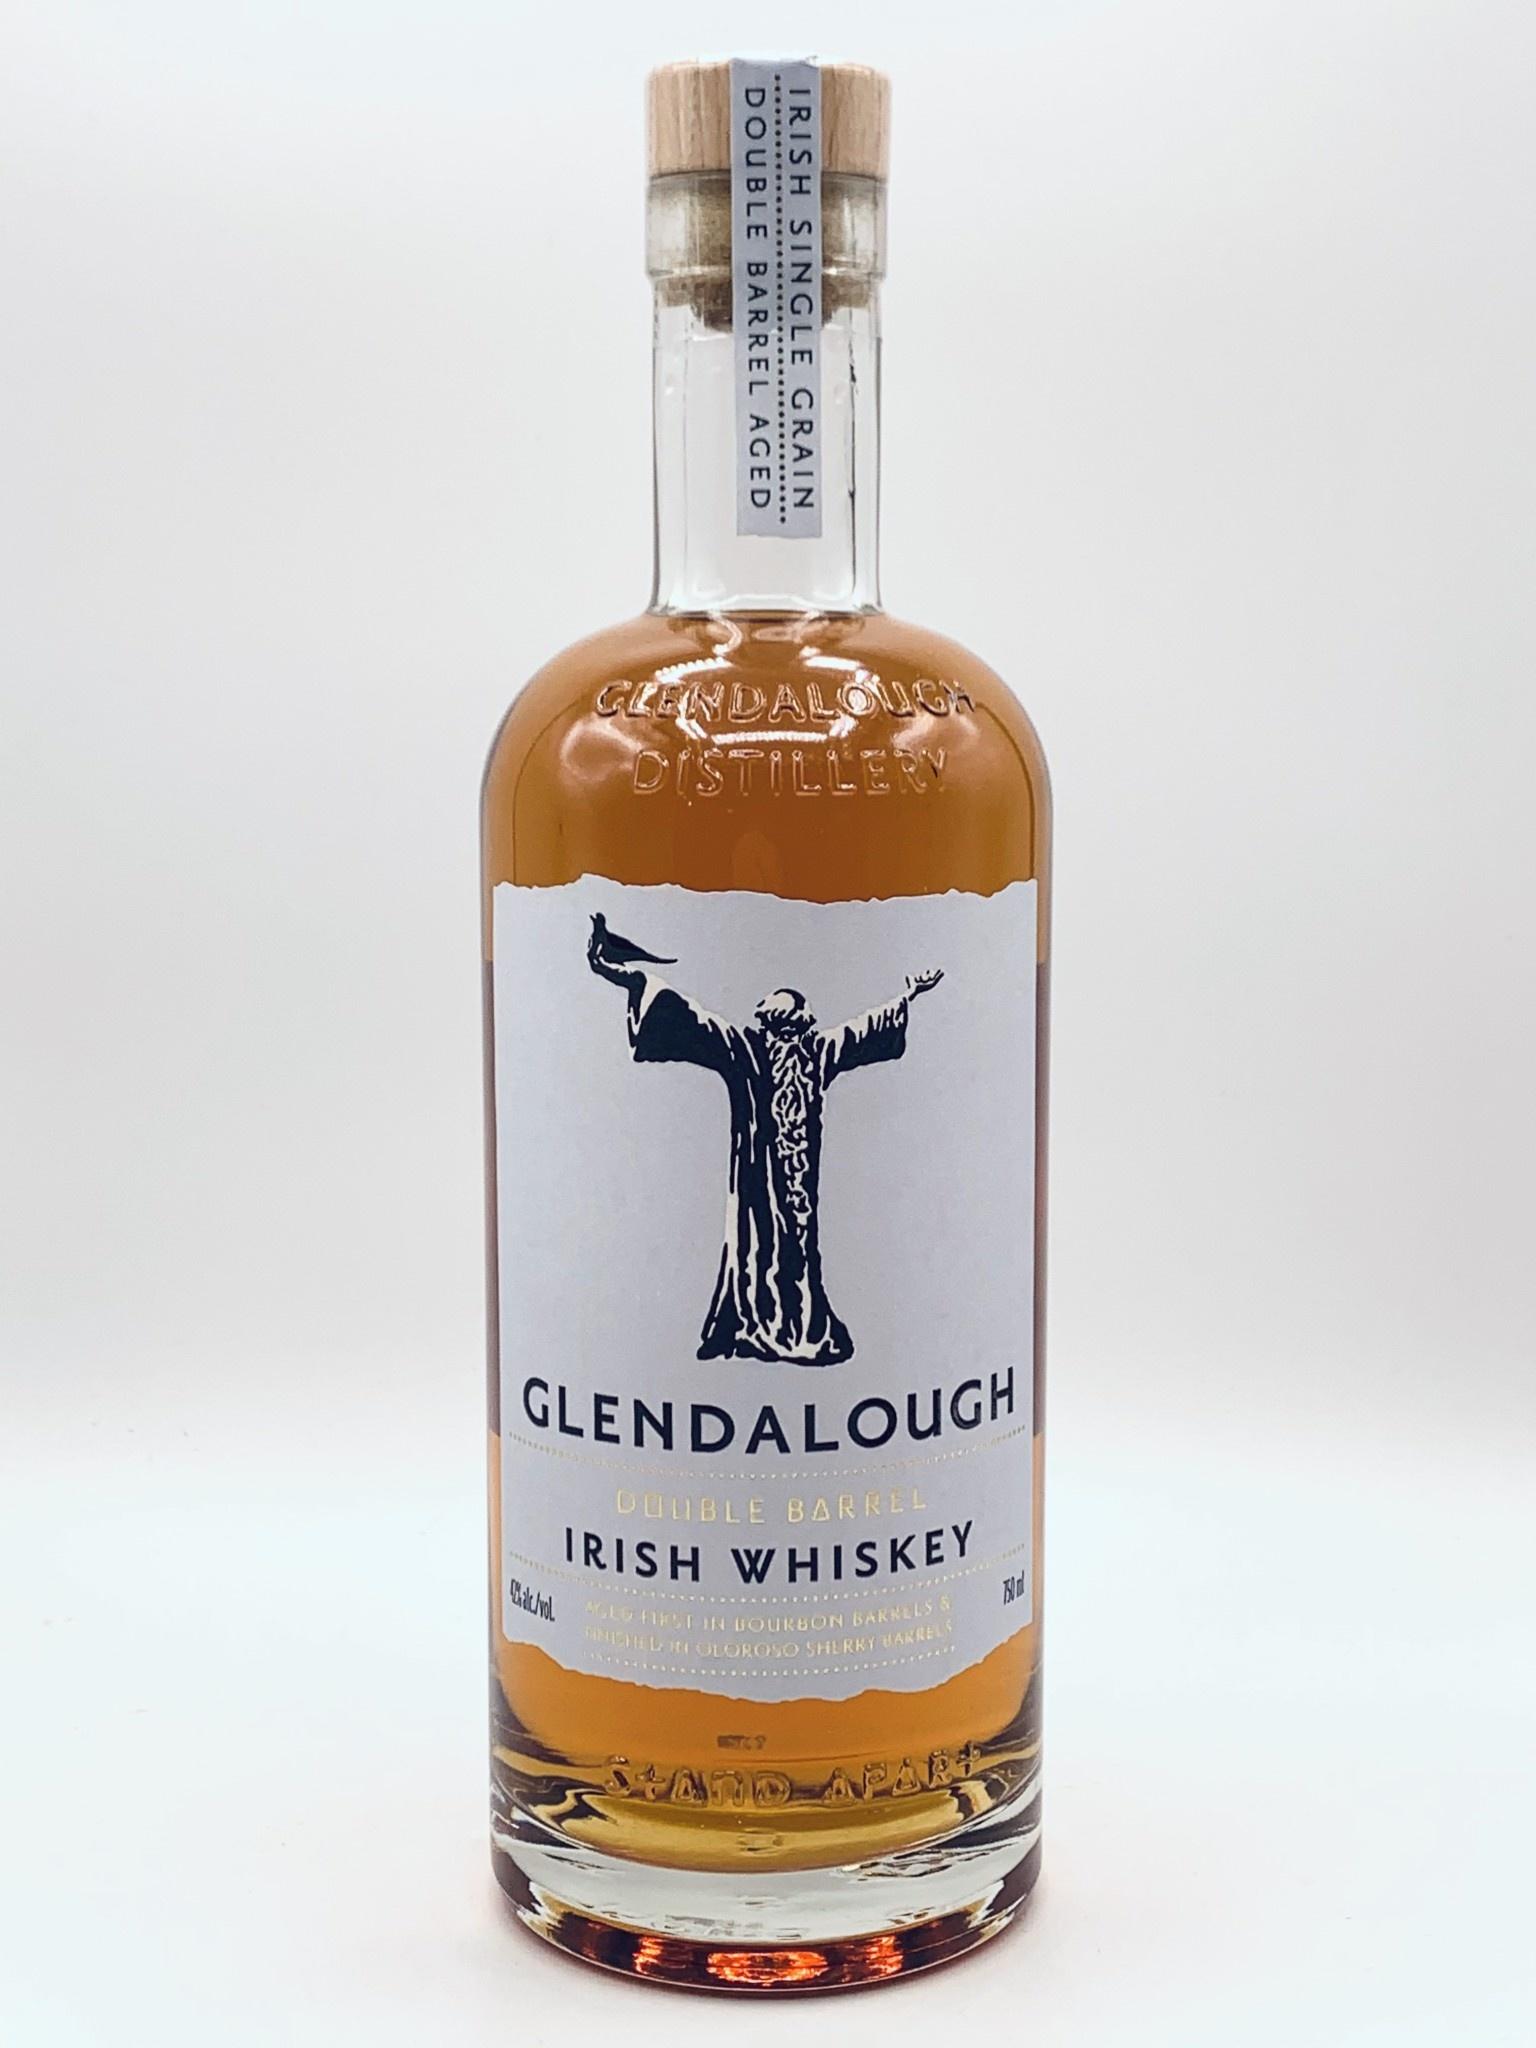 Glendalough Doube Barrel Irish Whiskey  750ml (84 proof)